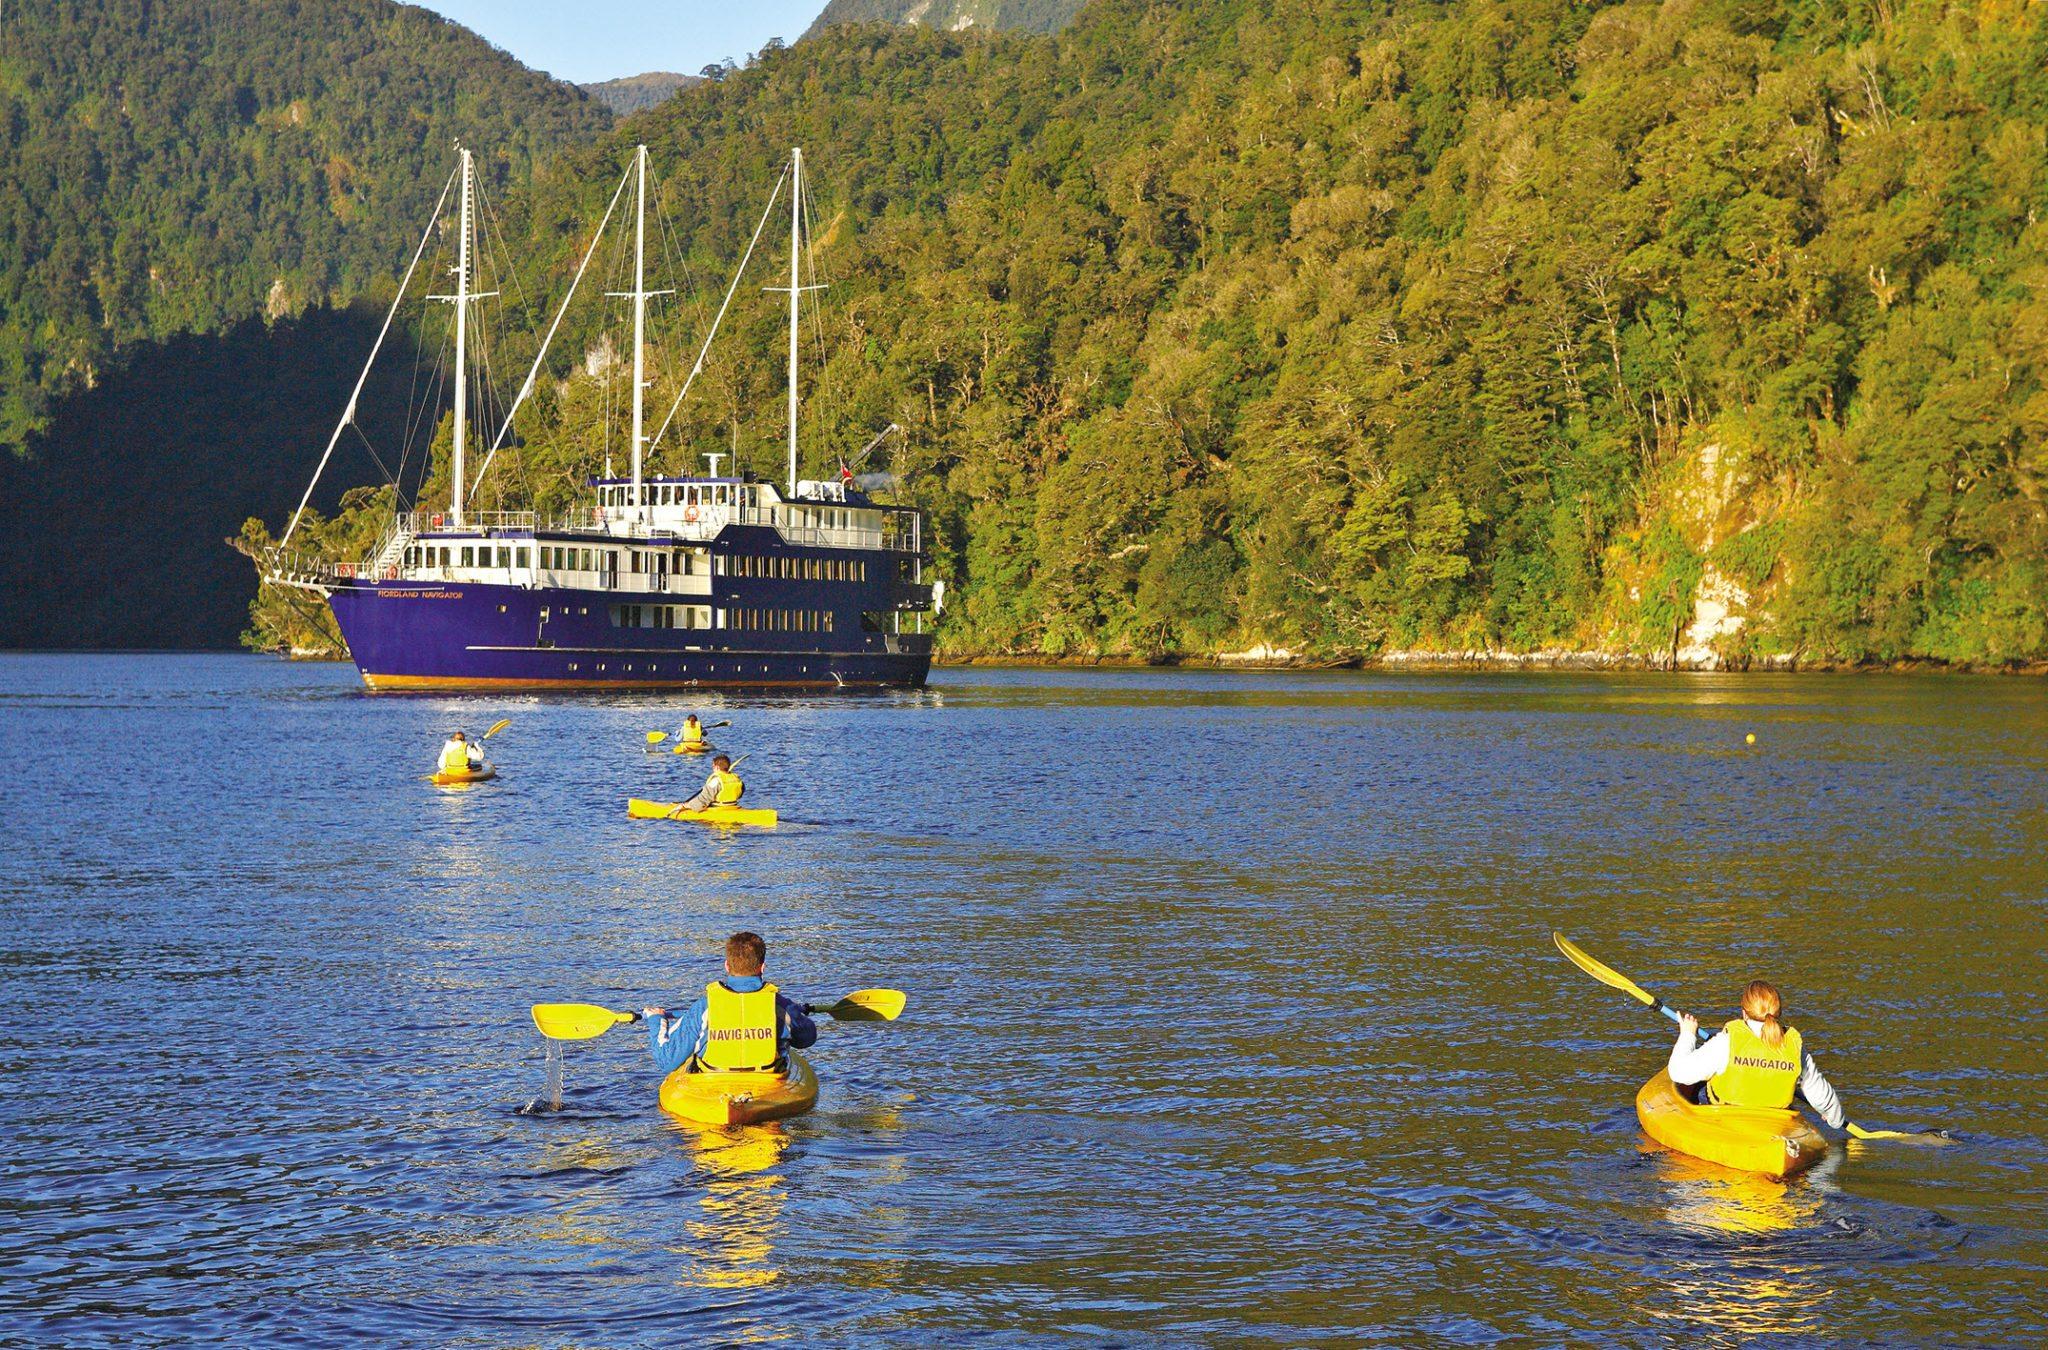 Kayaking on the Doubtful Sound